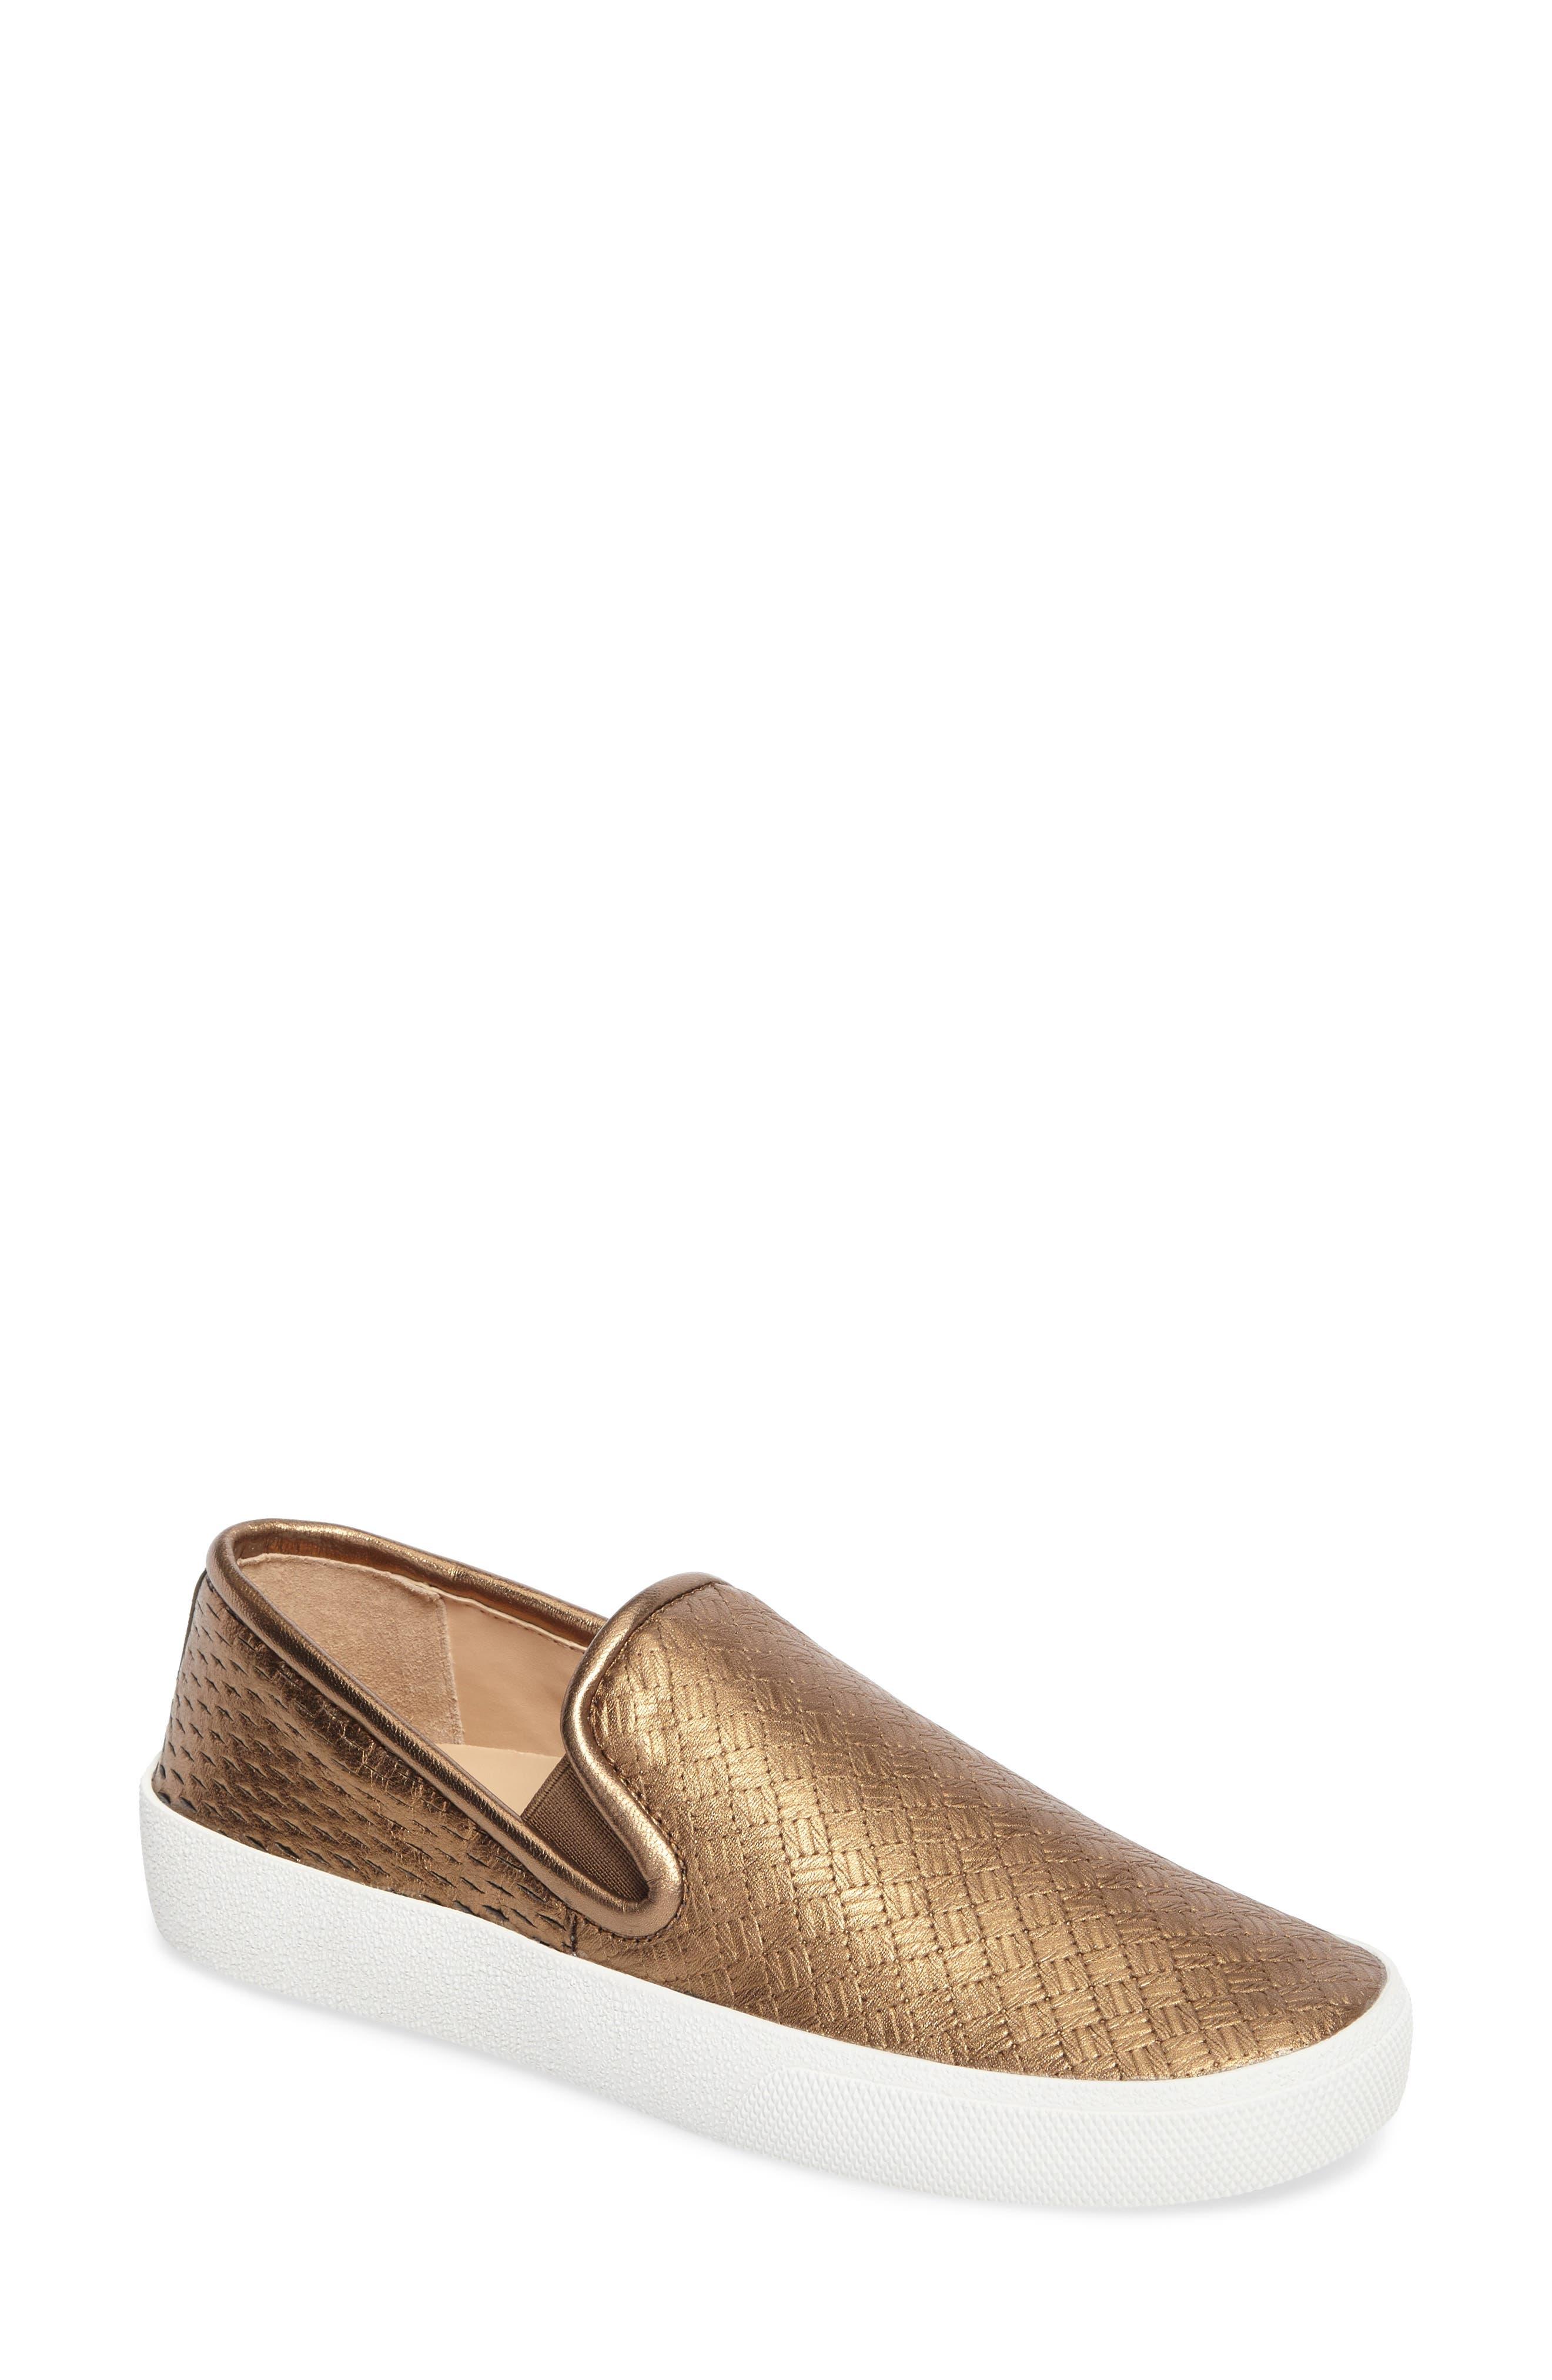 Main Image - Vince Camuto Cariana Slip-On Sneaker (Women)